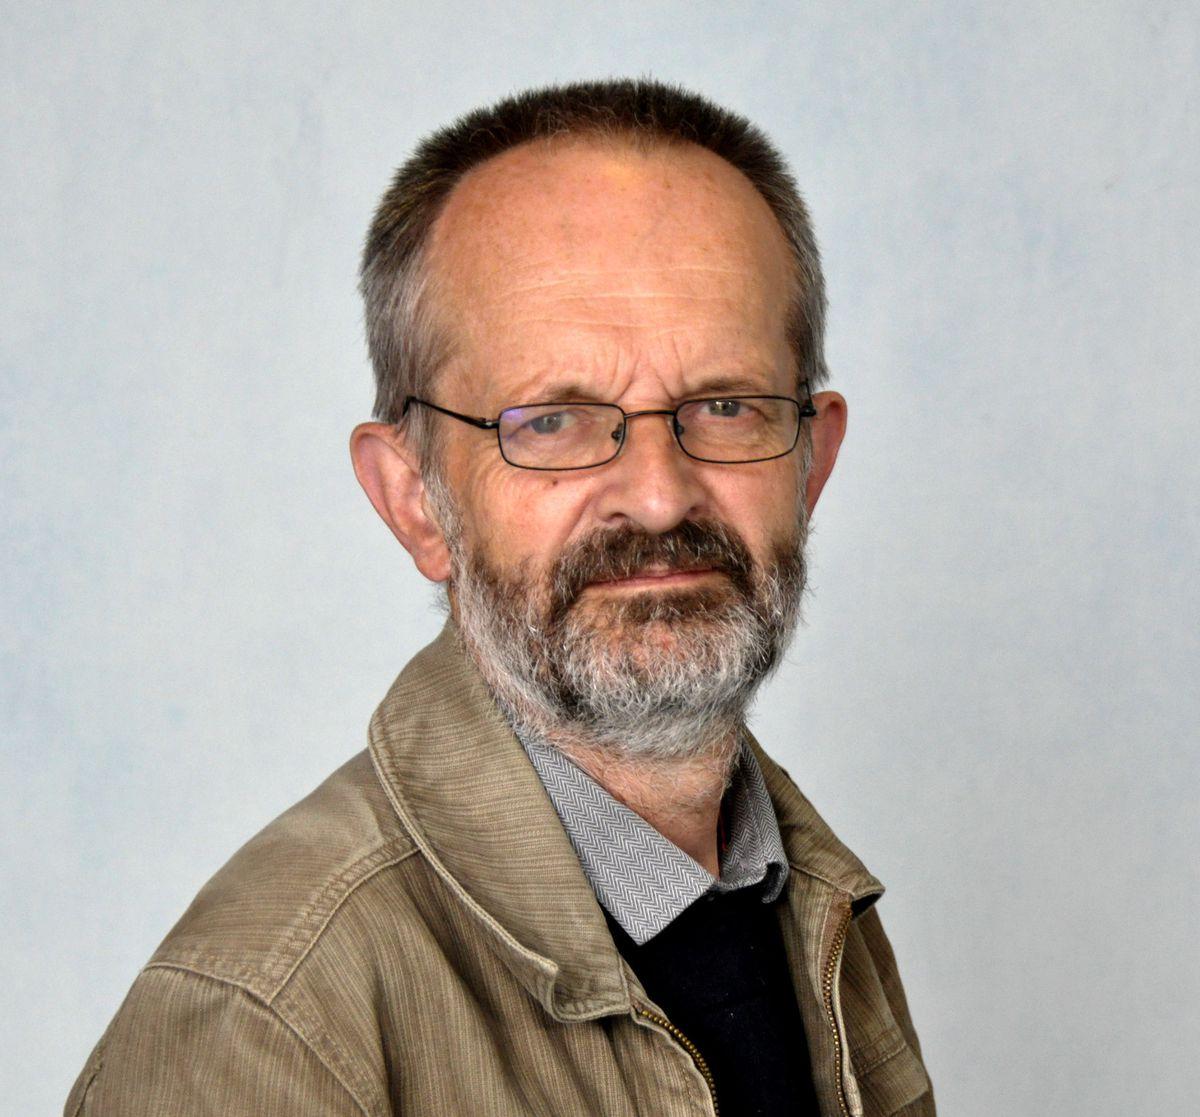 Councillor David Vasmer has become the Liberal Democrat group leader on Shropshire Council